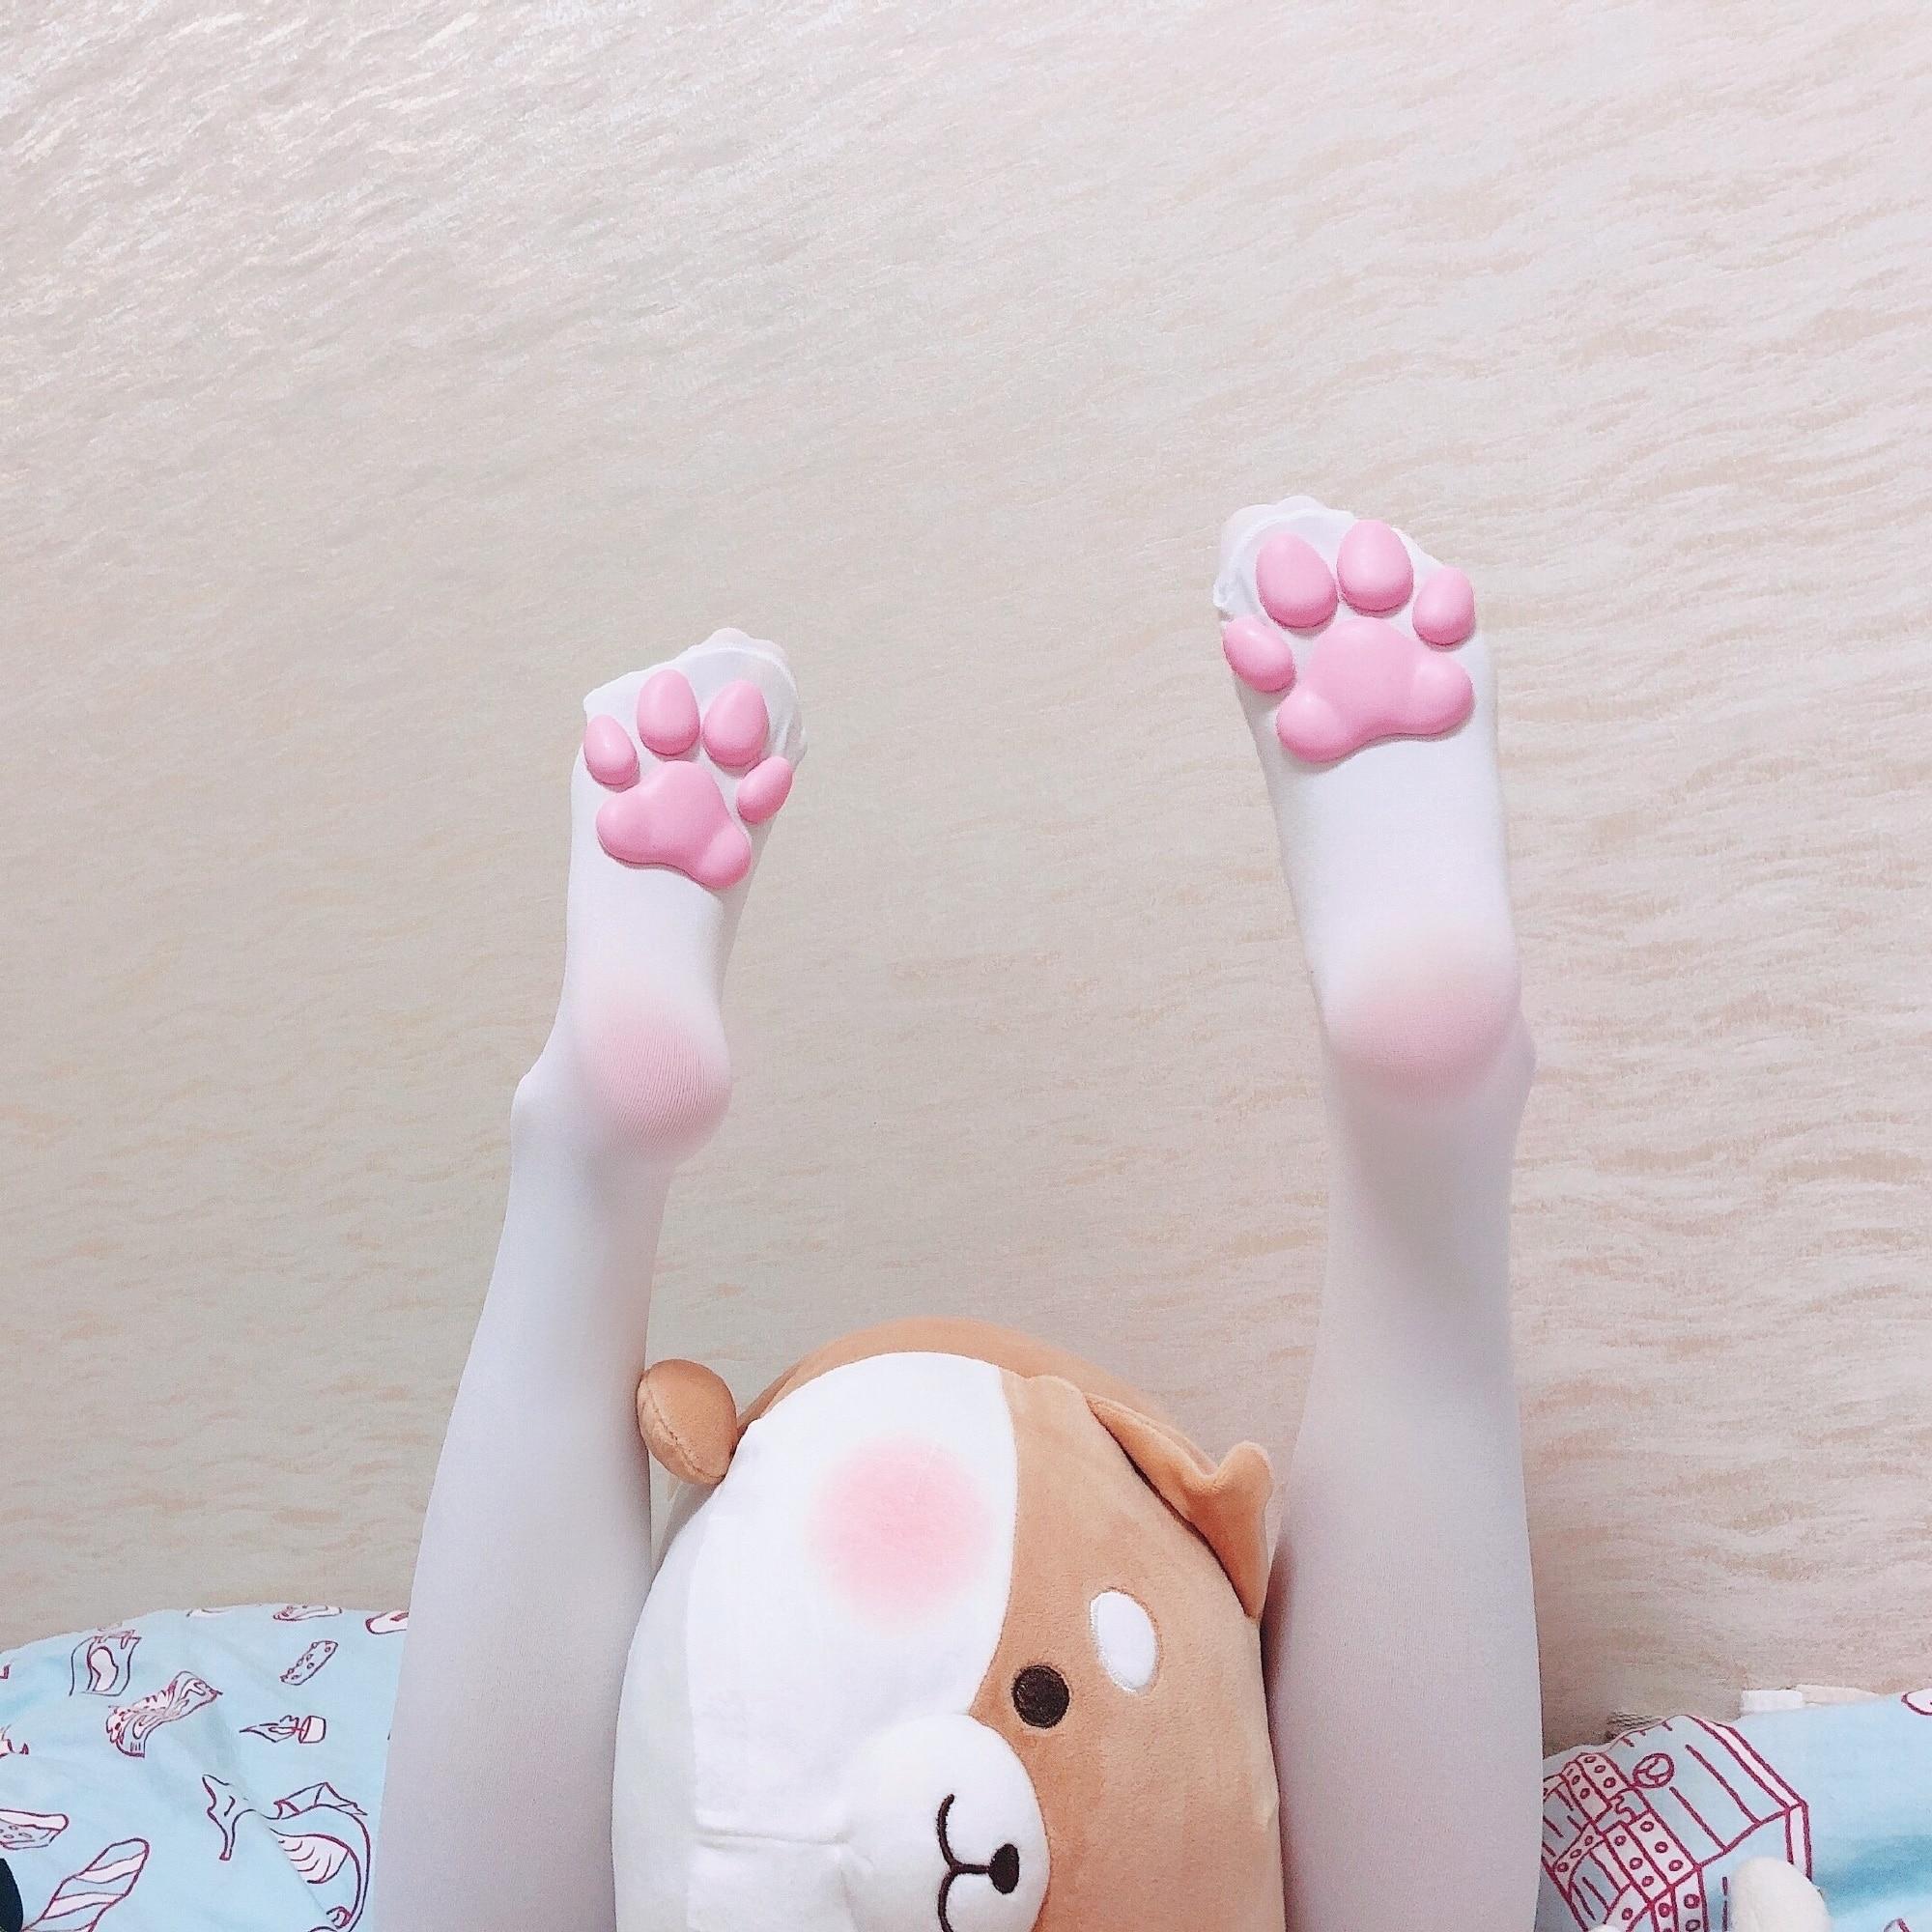 Pawpads Kitty Stockings 4